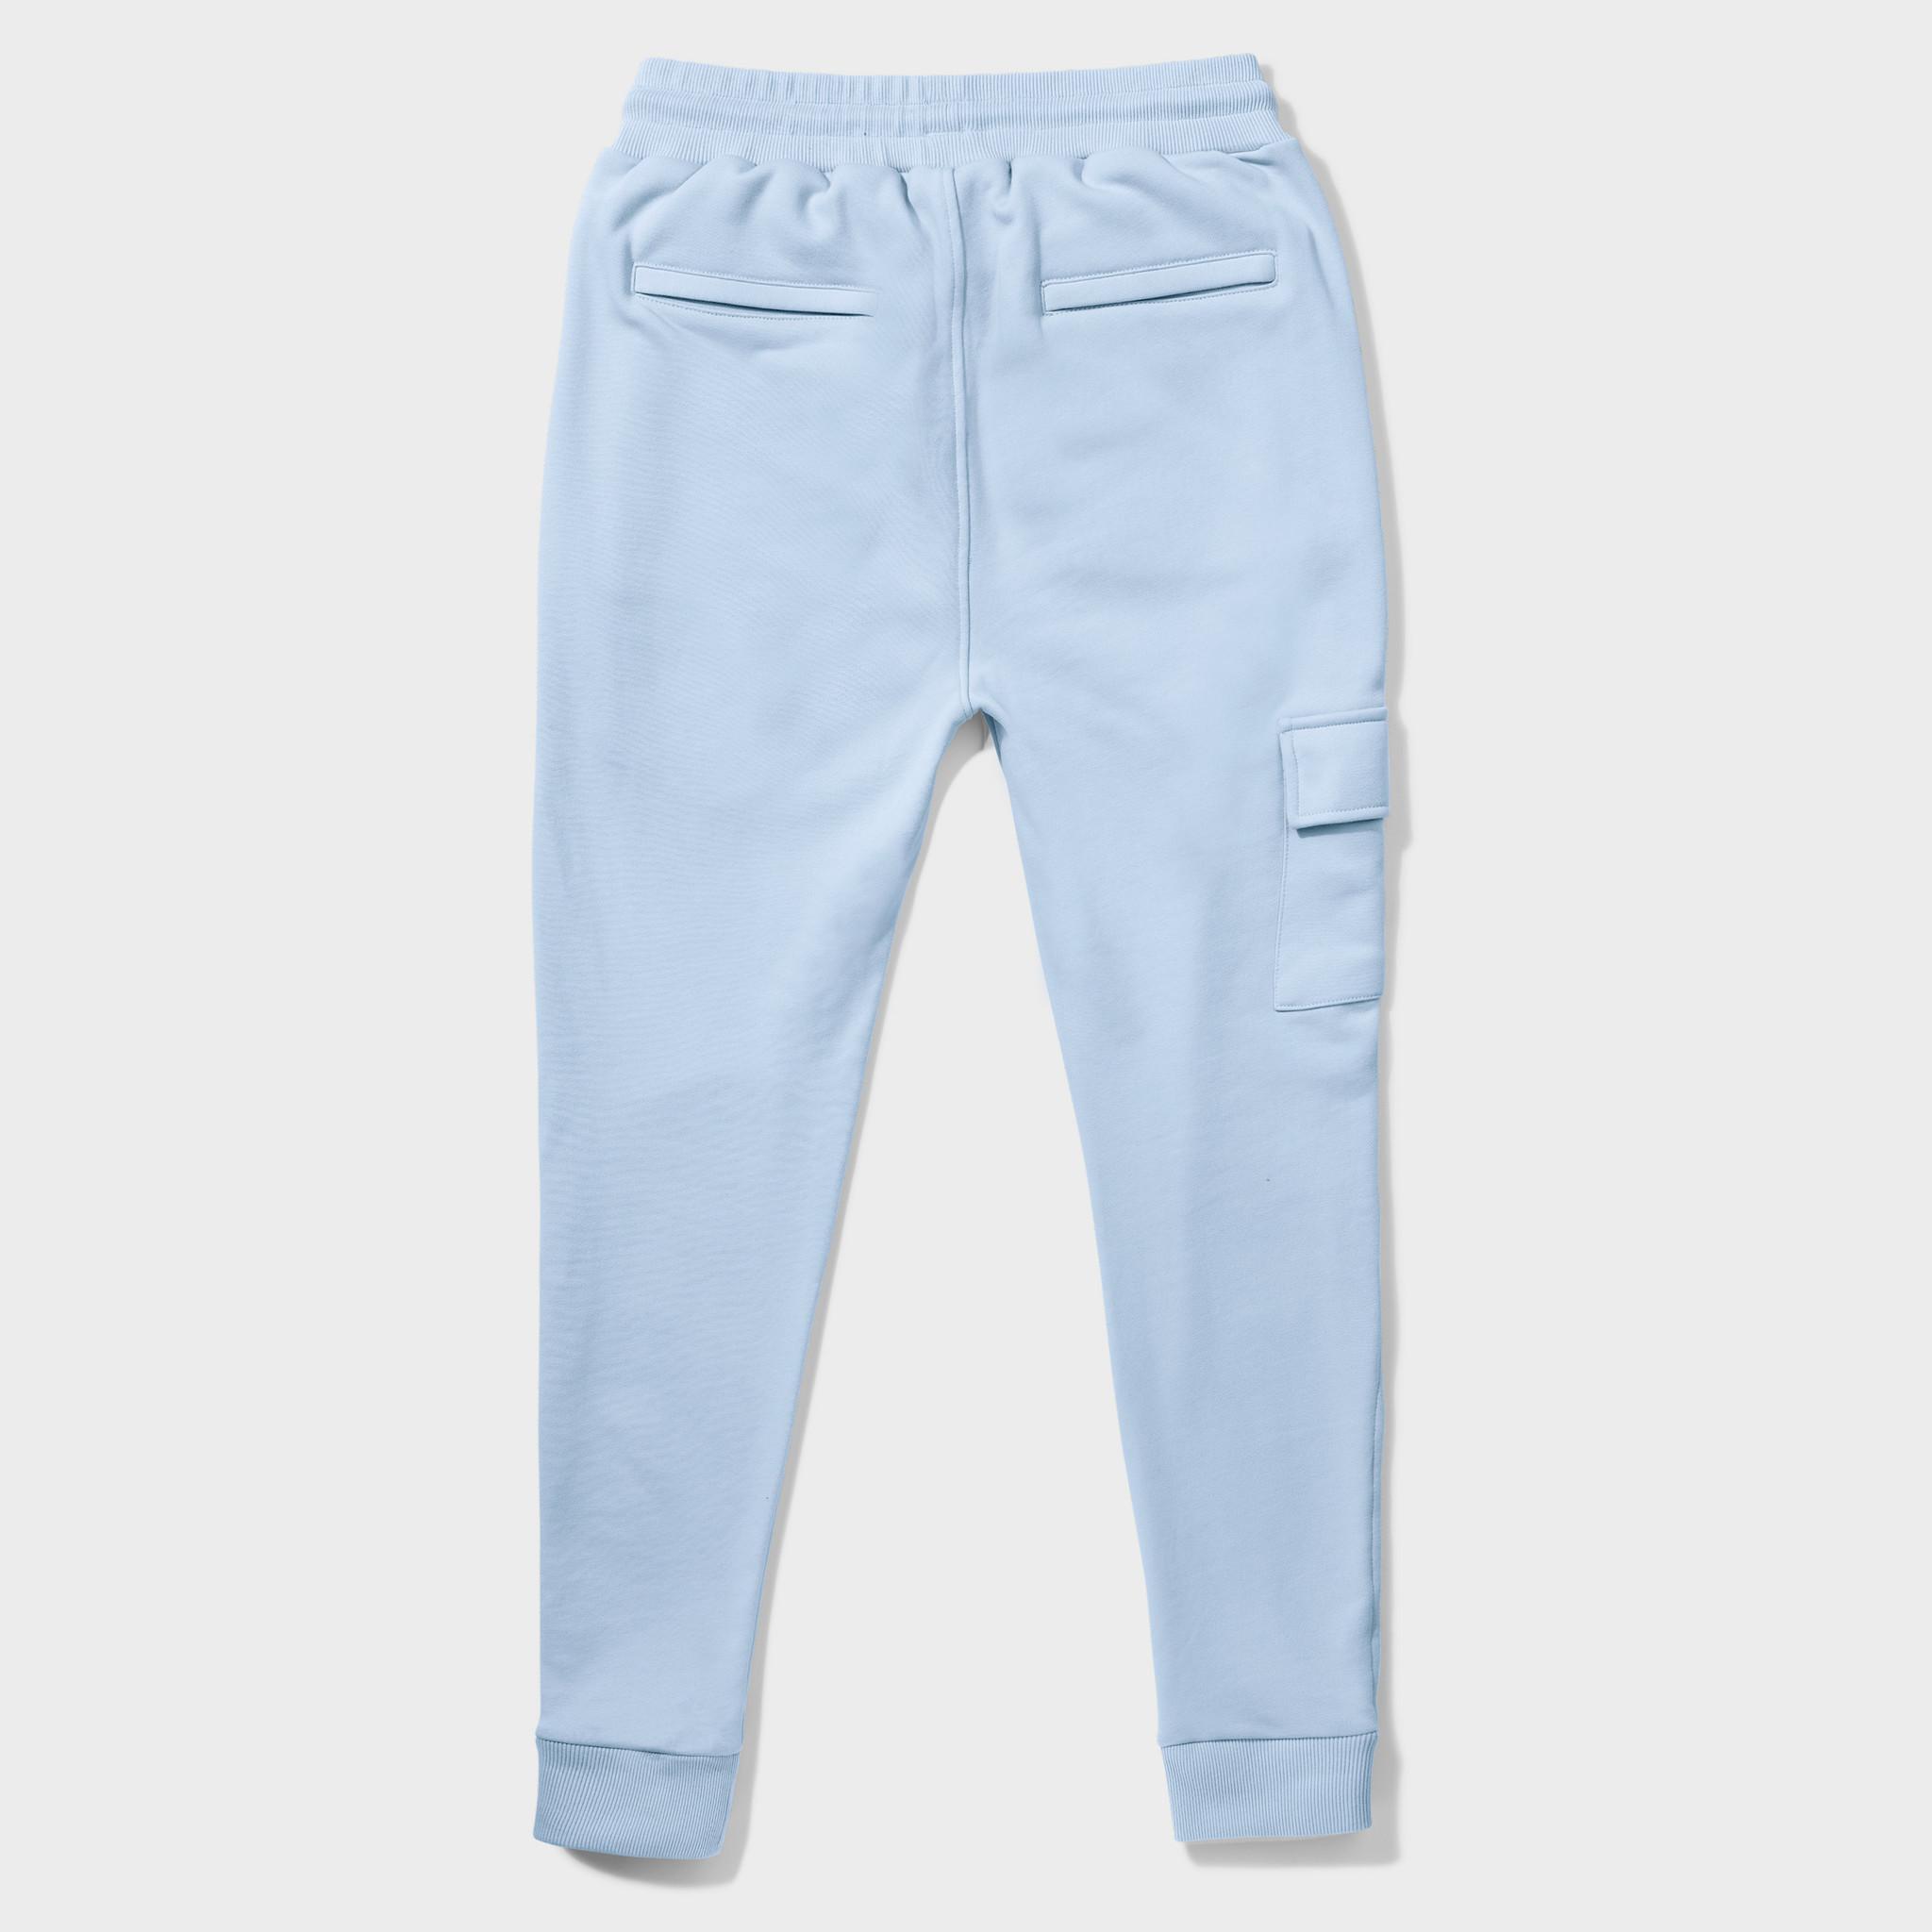 Wafi Signature Pants Light Blue-2